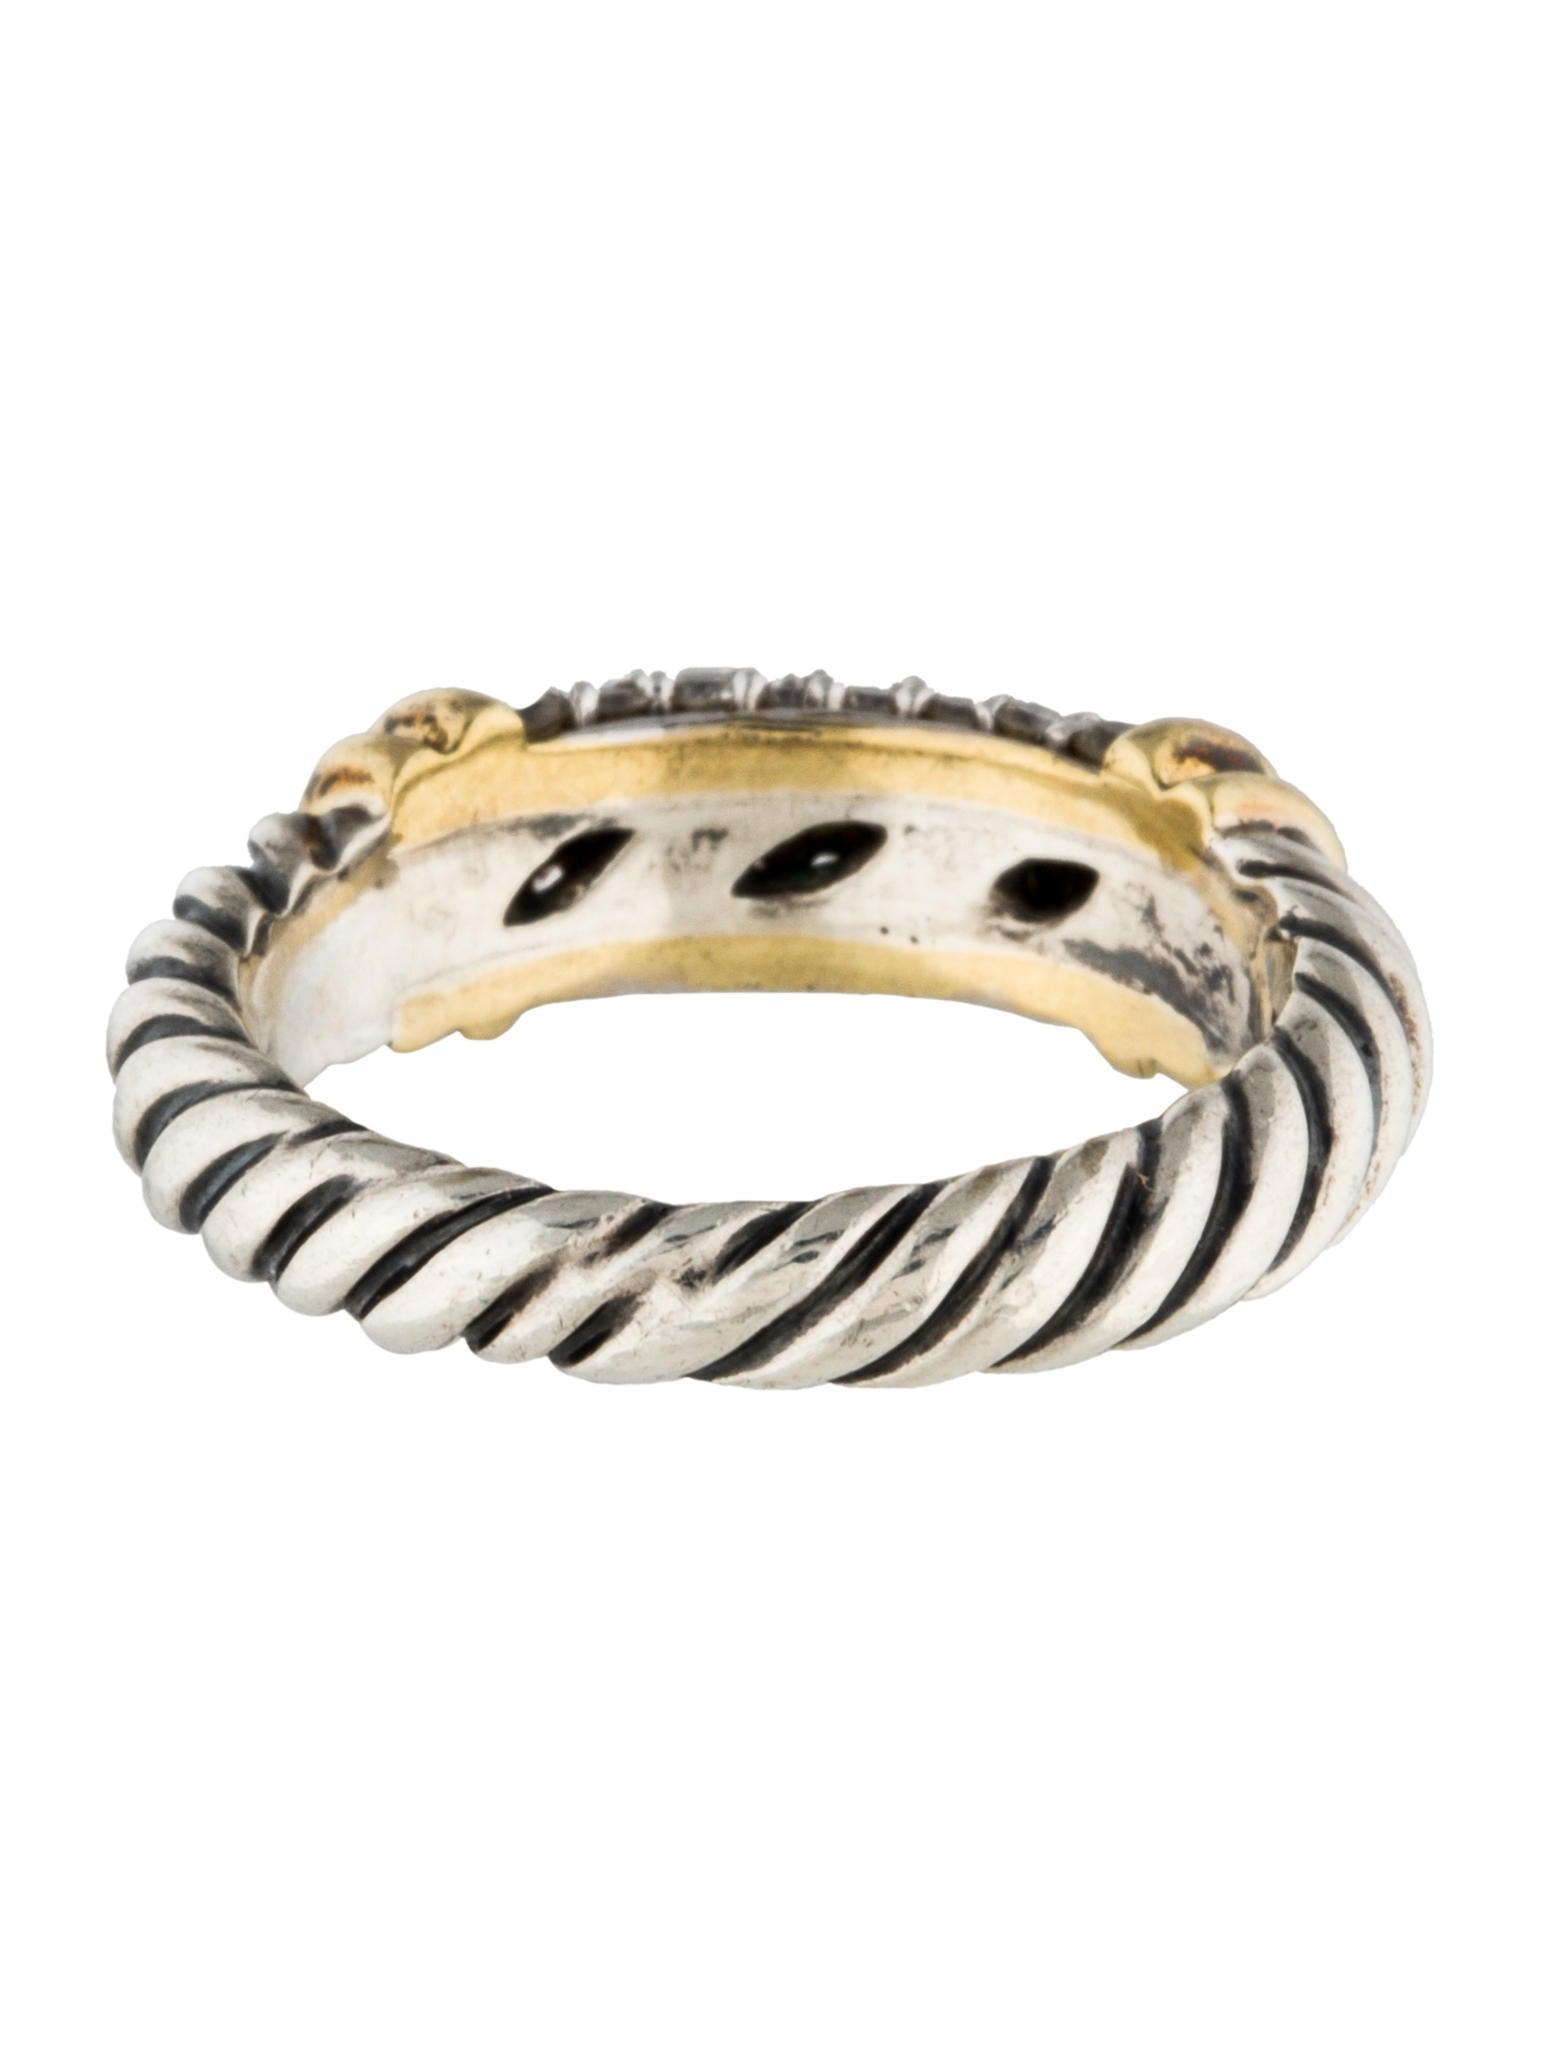 David yurman pav diamond metro cable ring rings for David yurman inspired jewelry rings